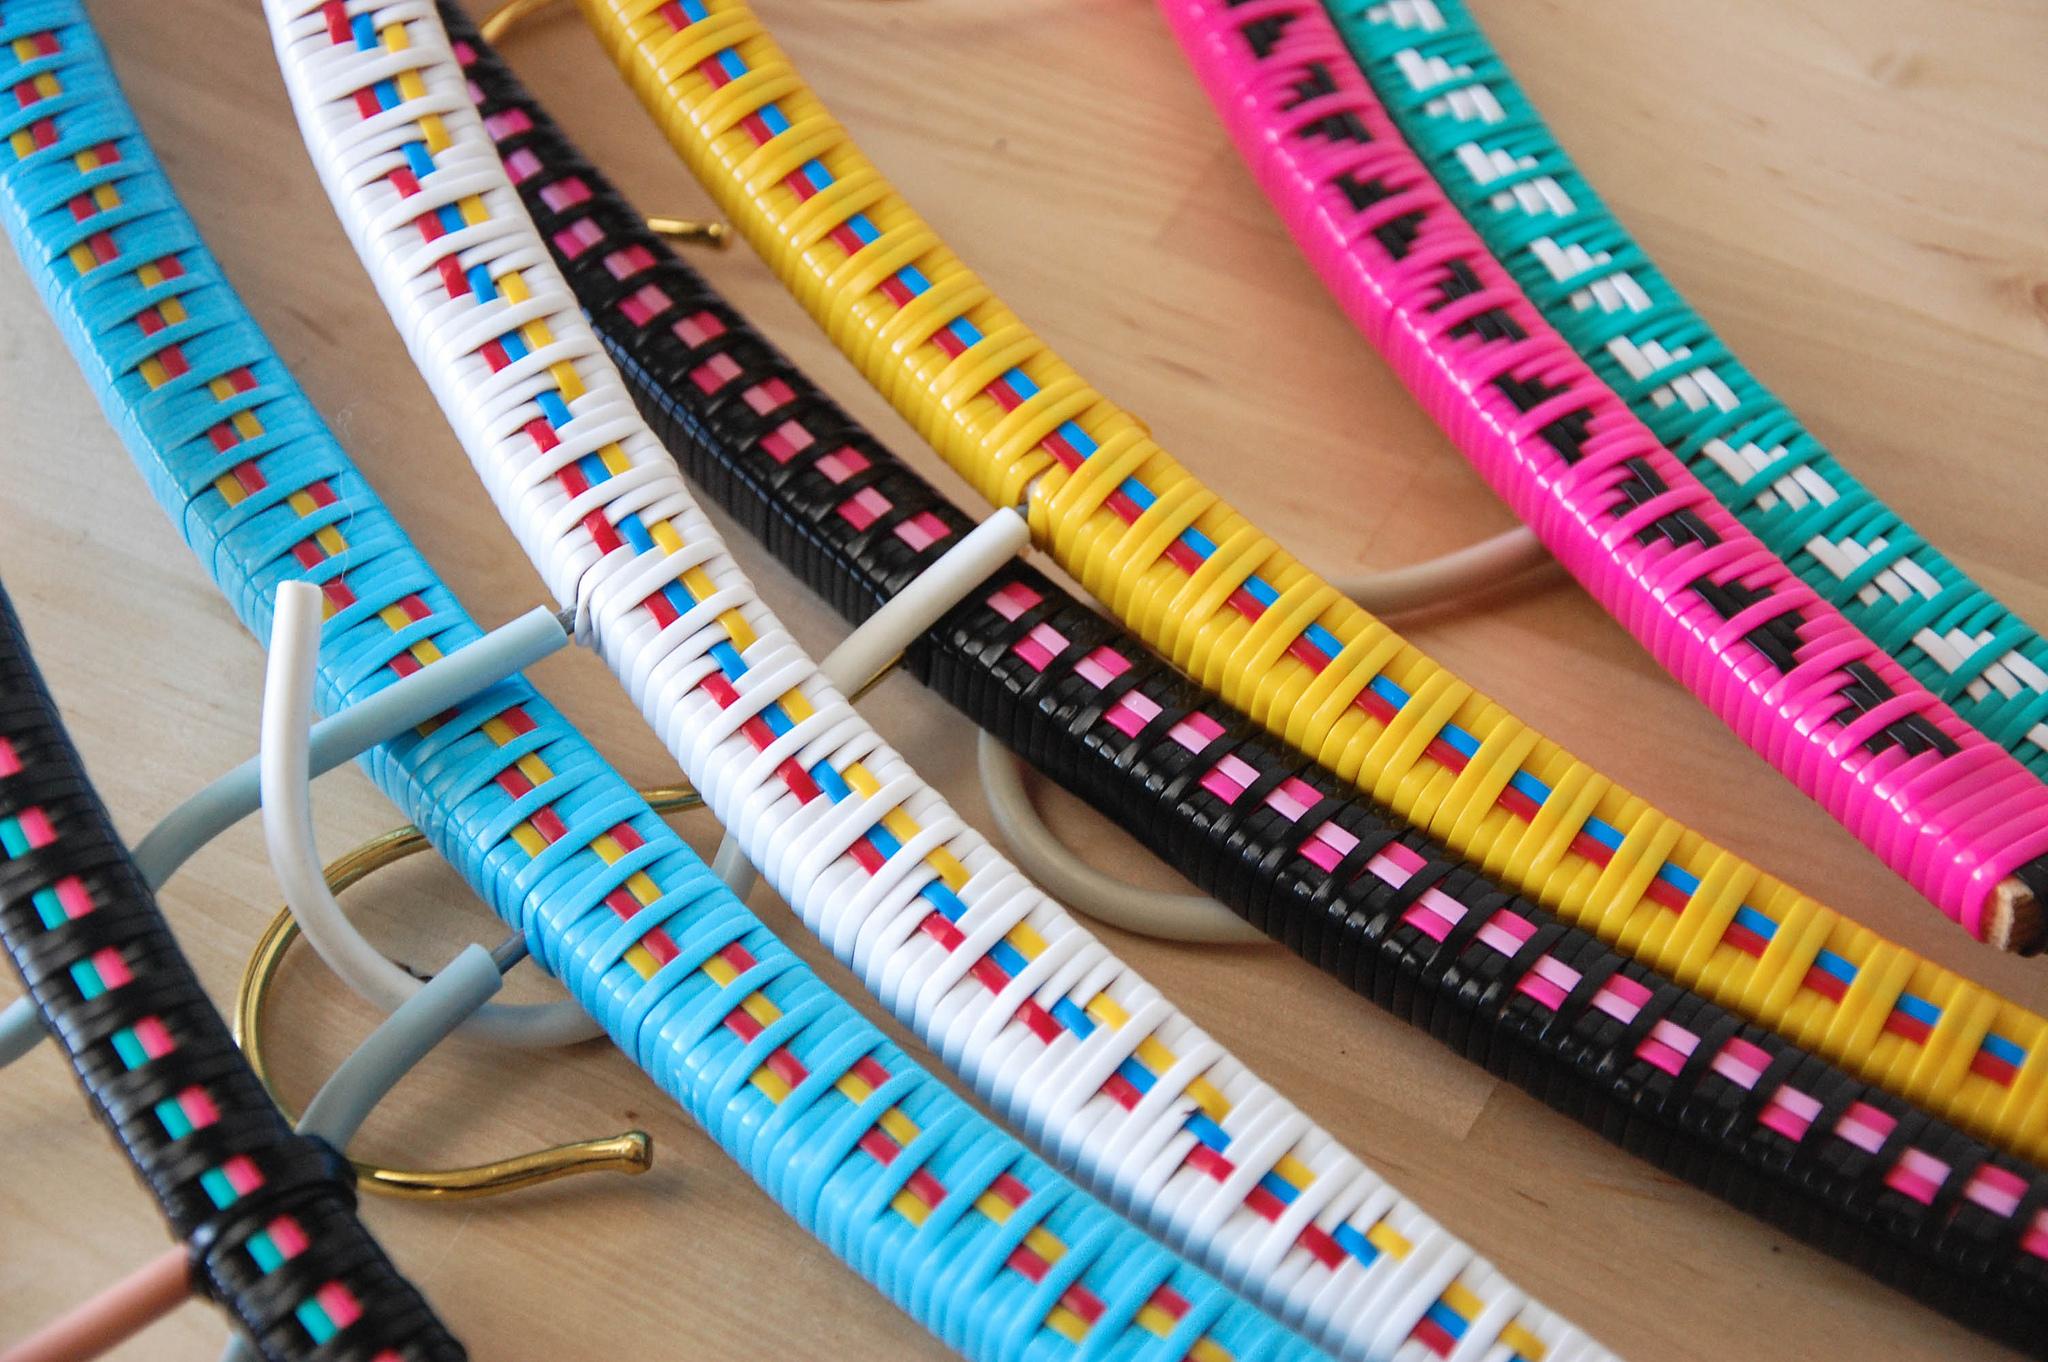 Diy Plastic Lace Woven Clothes Hangers Diy Crafts